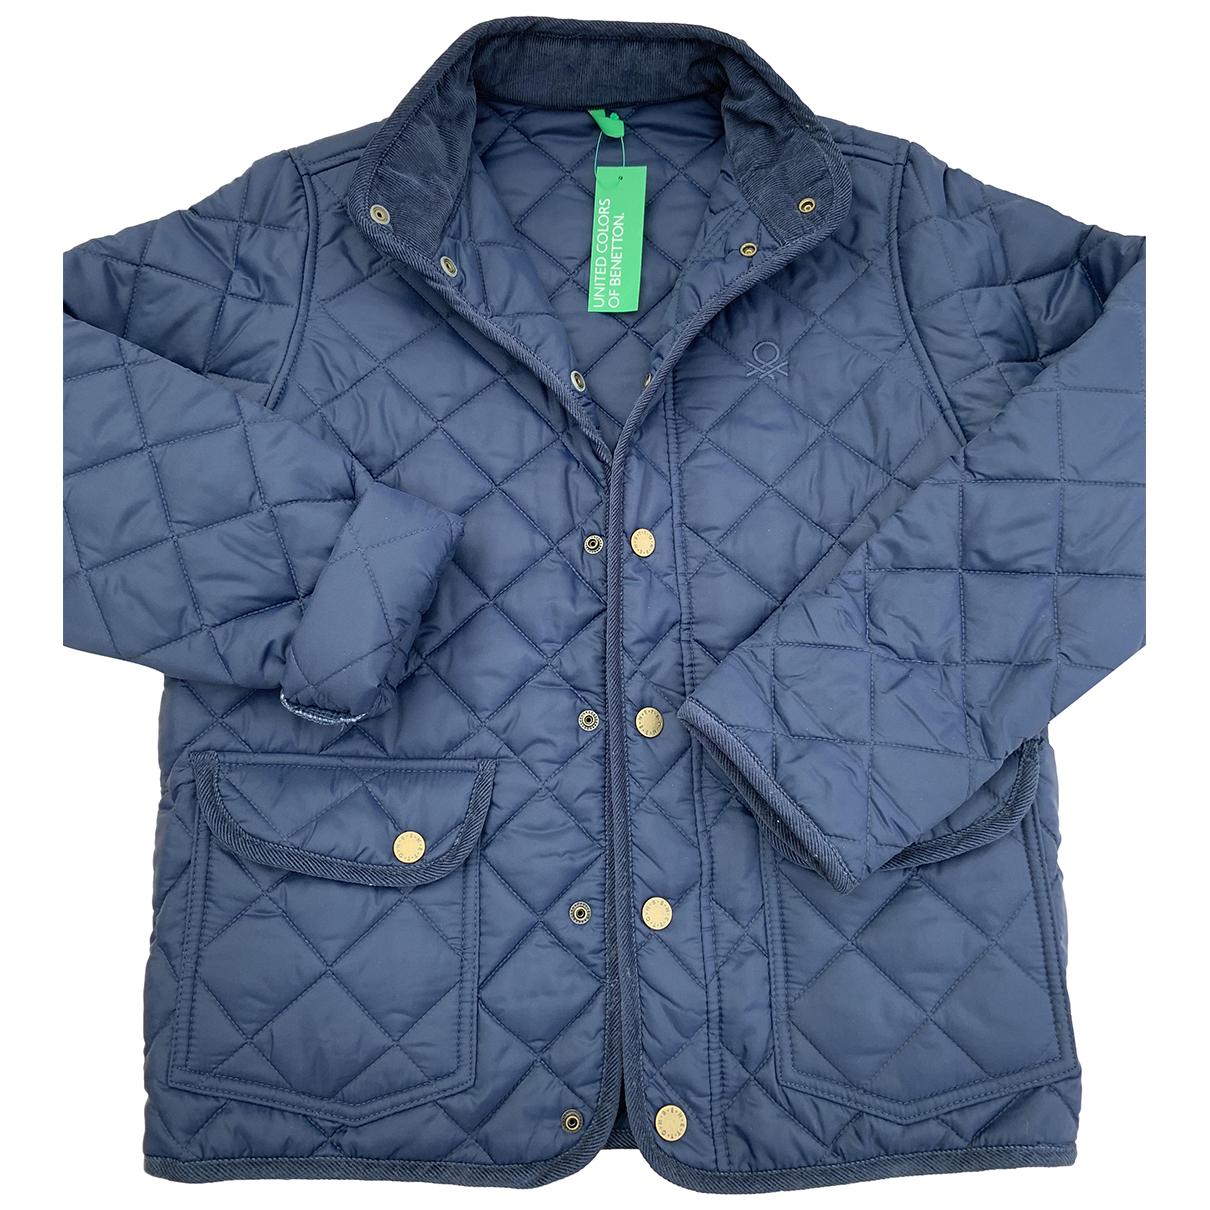 Benetton \N Jacke, Maentel in  Blau Polyester